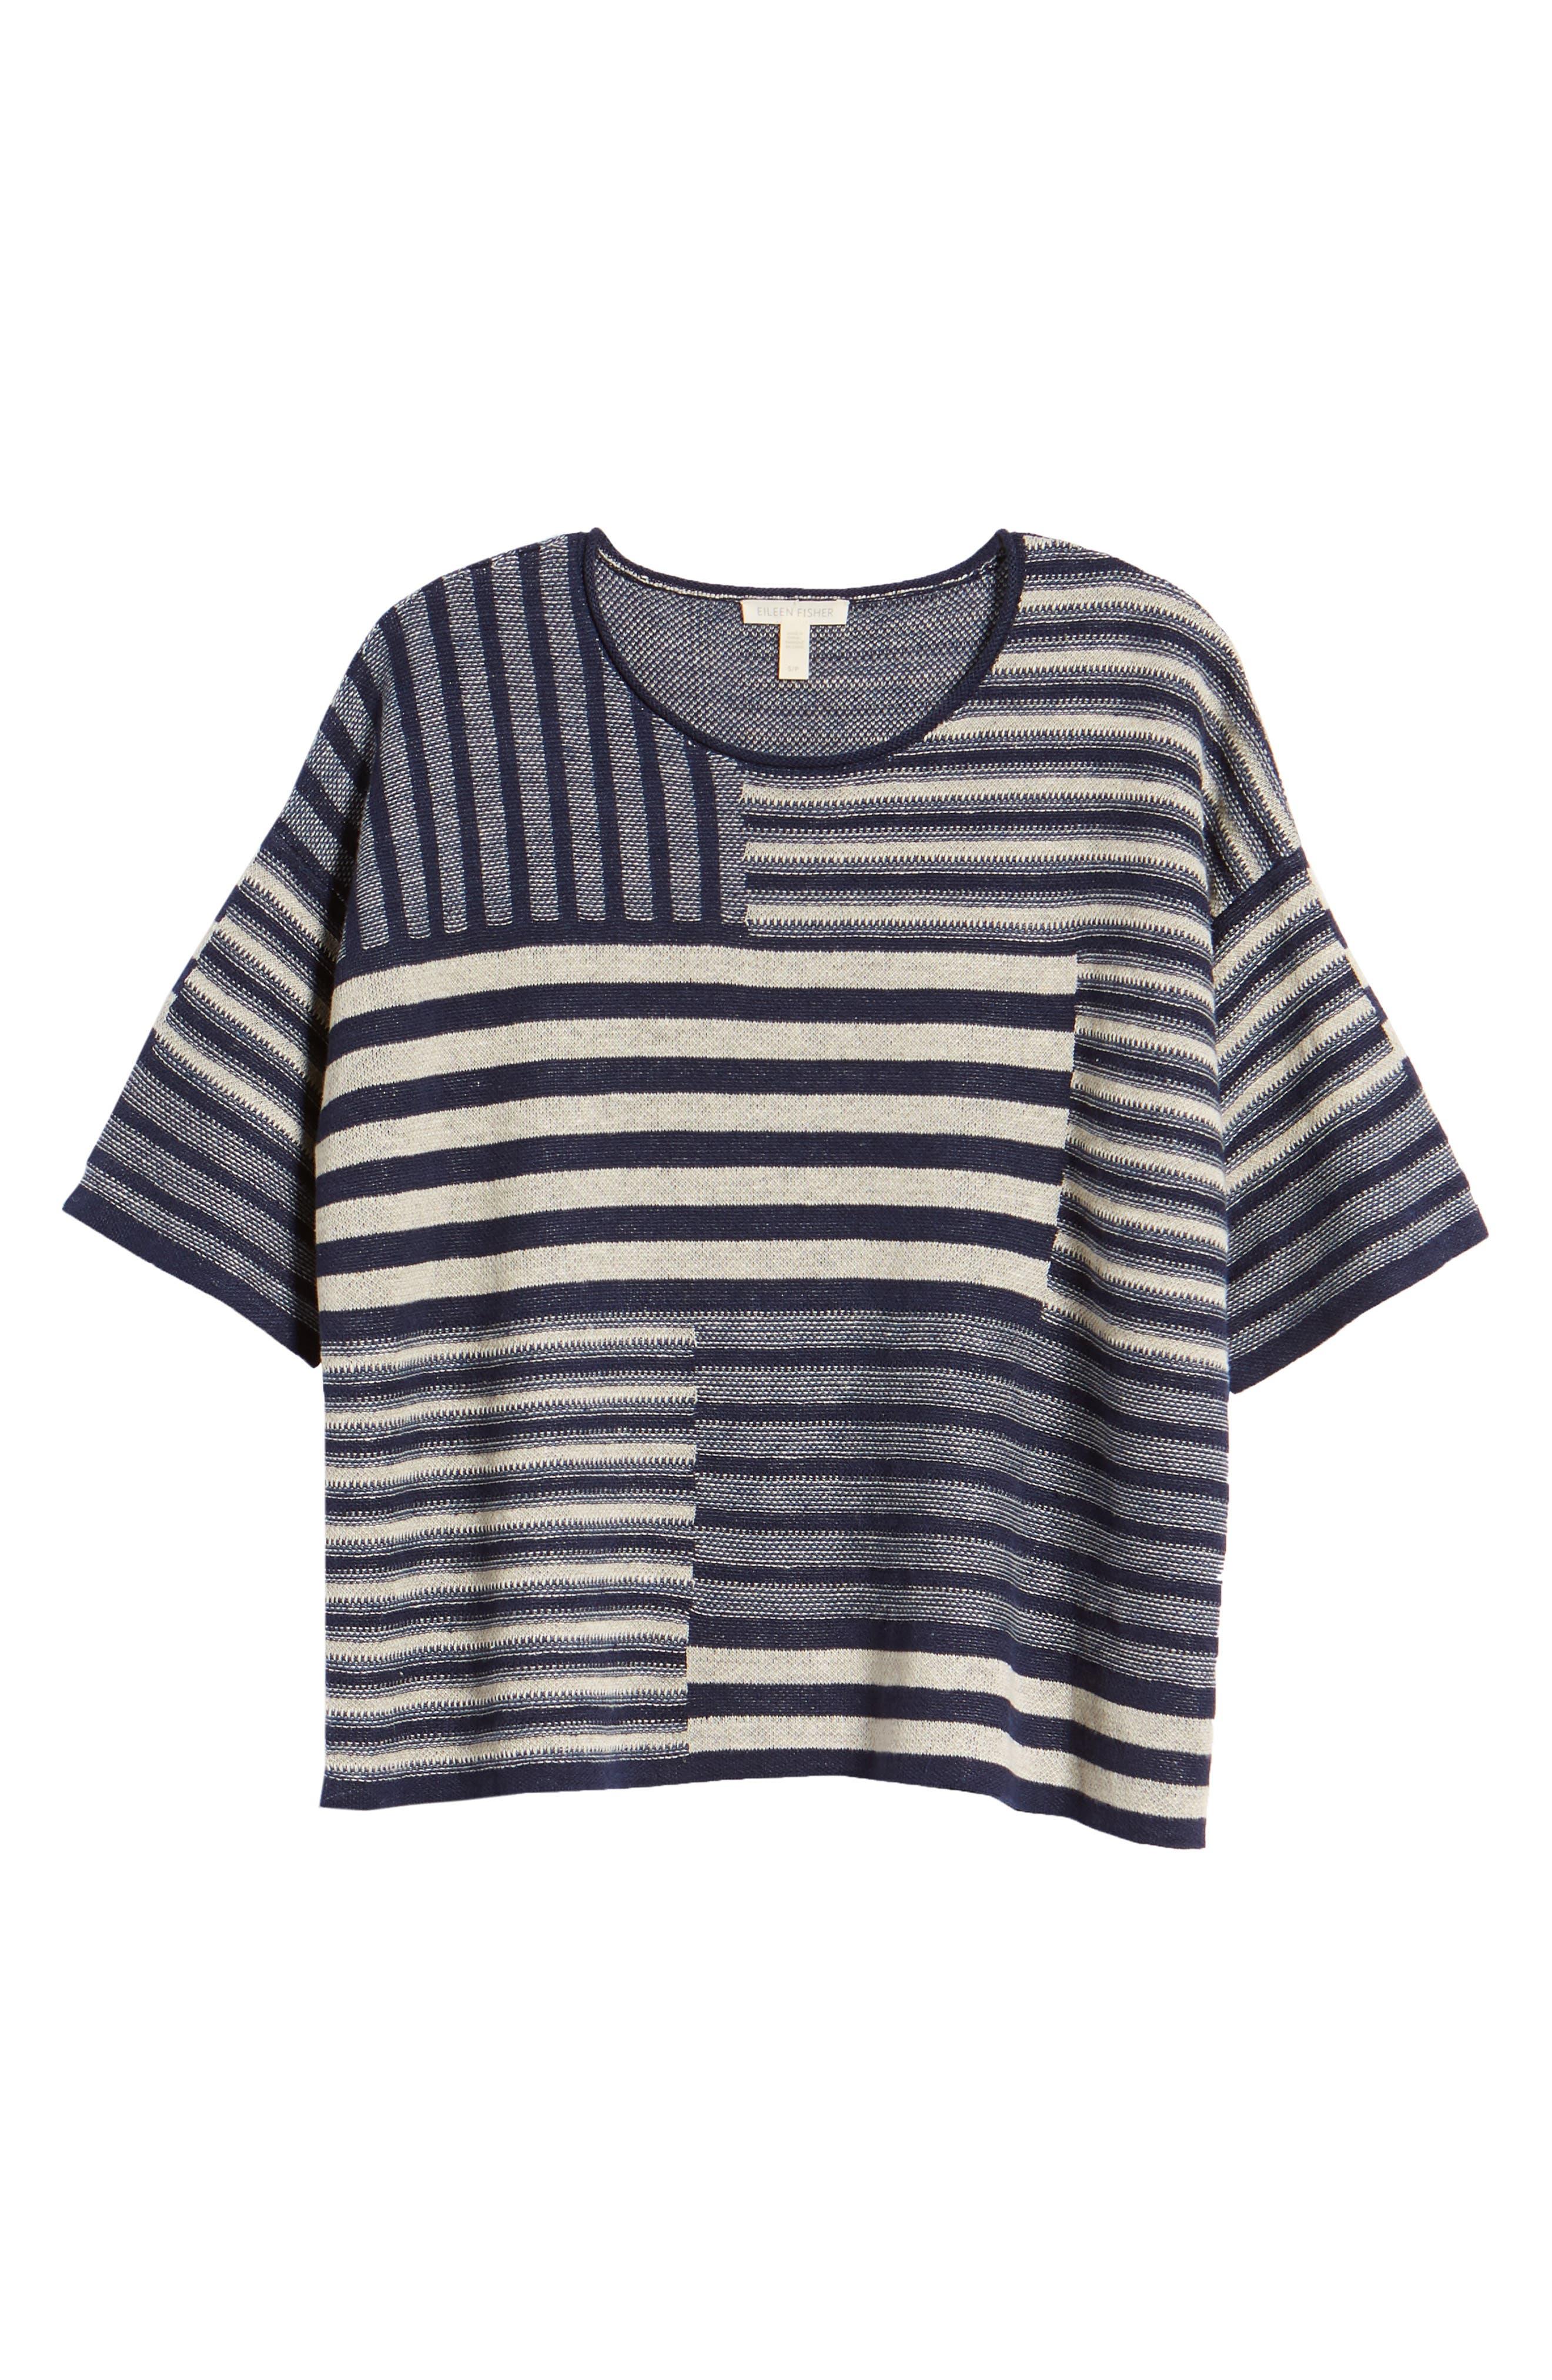 Mixed Stripe Organic Linen Top,                             Alternate thumbnail 7, color,                             480